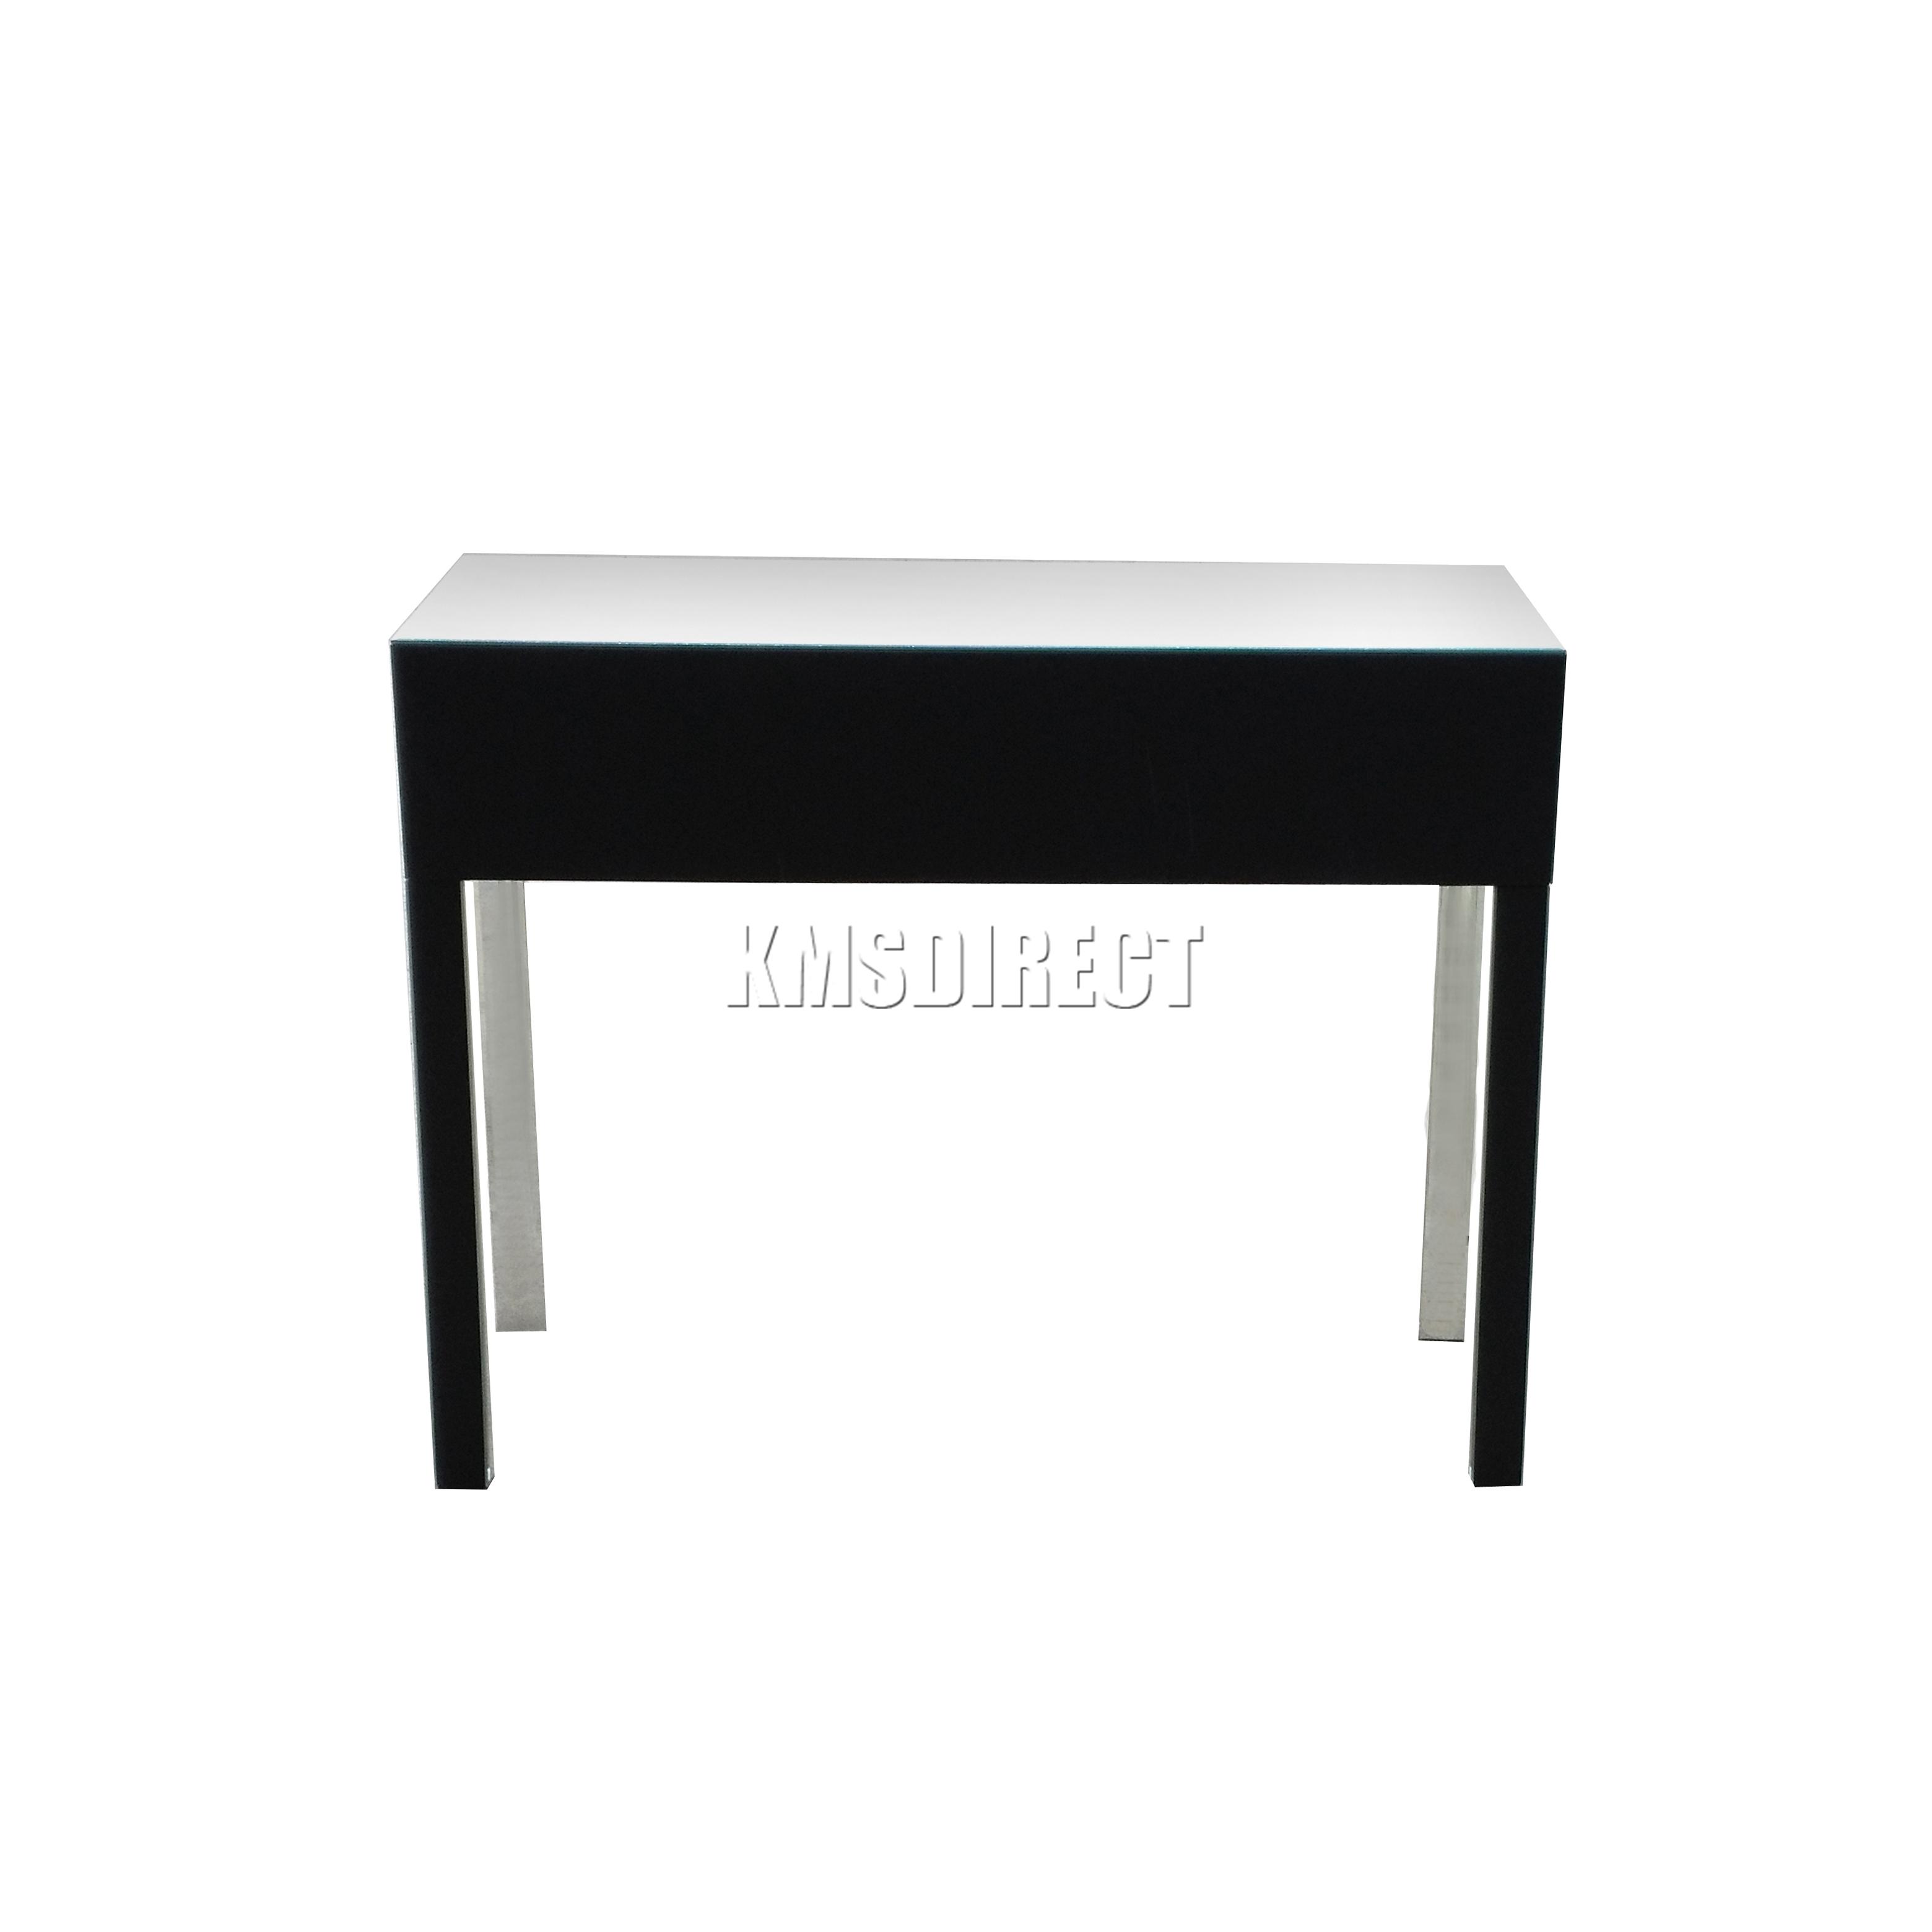 Foxhunter reflectante muebles cristal 2 cajones tocador for Muebles ebay